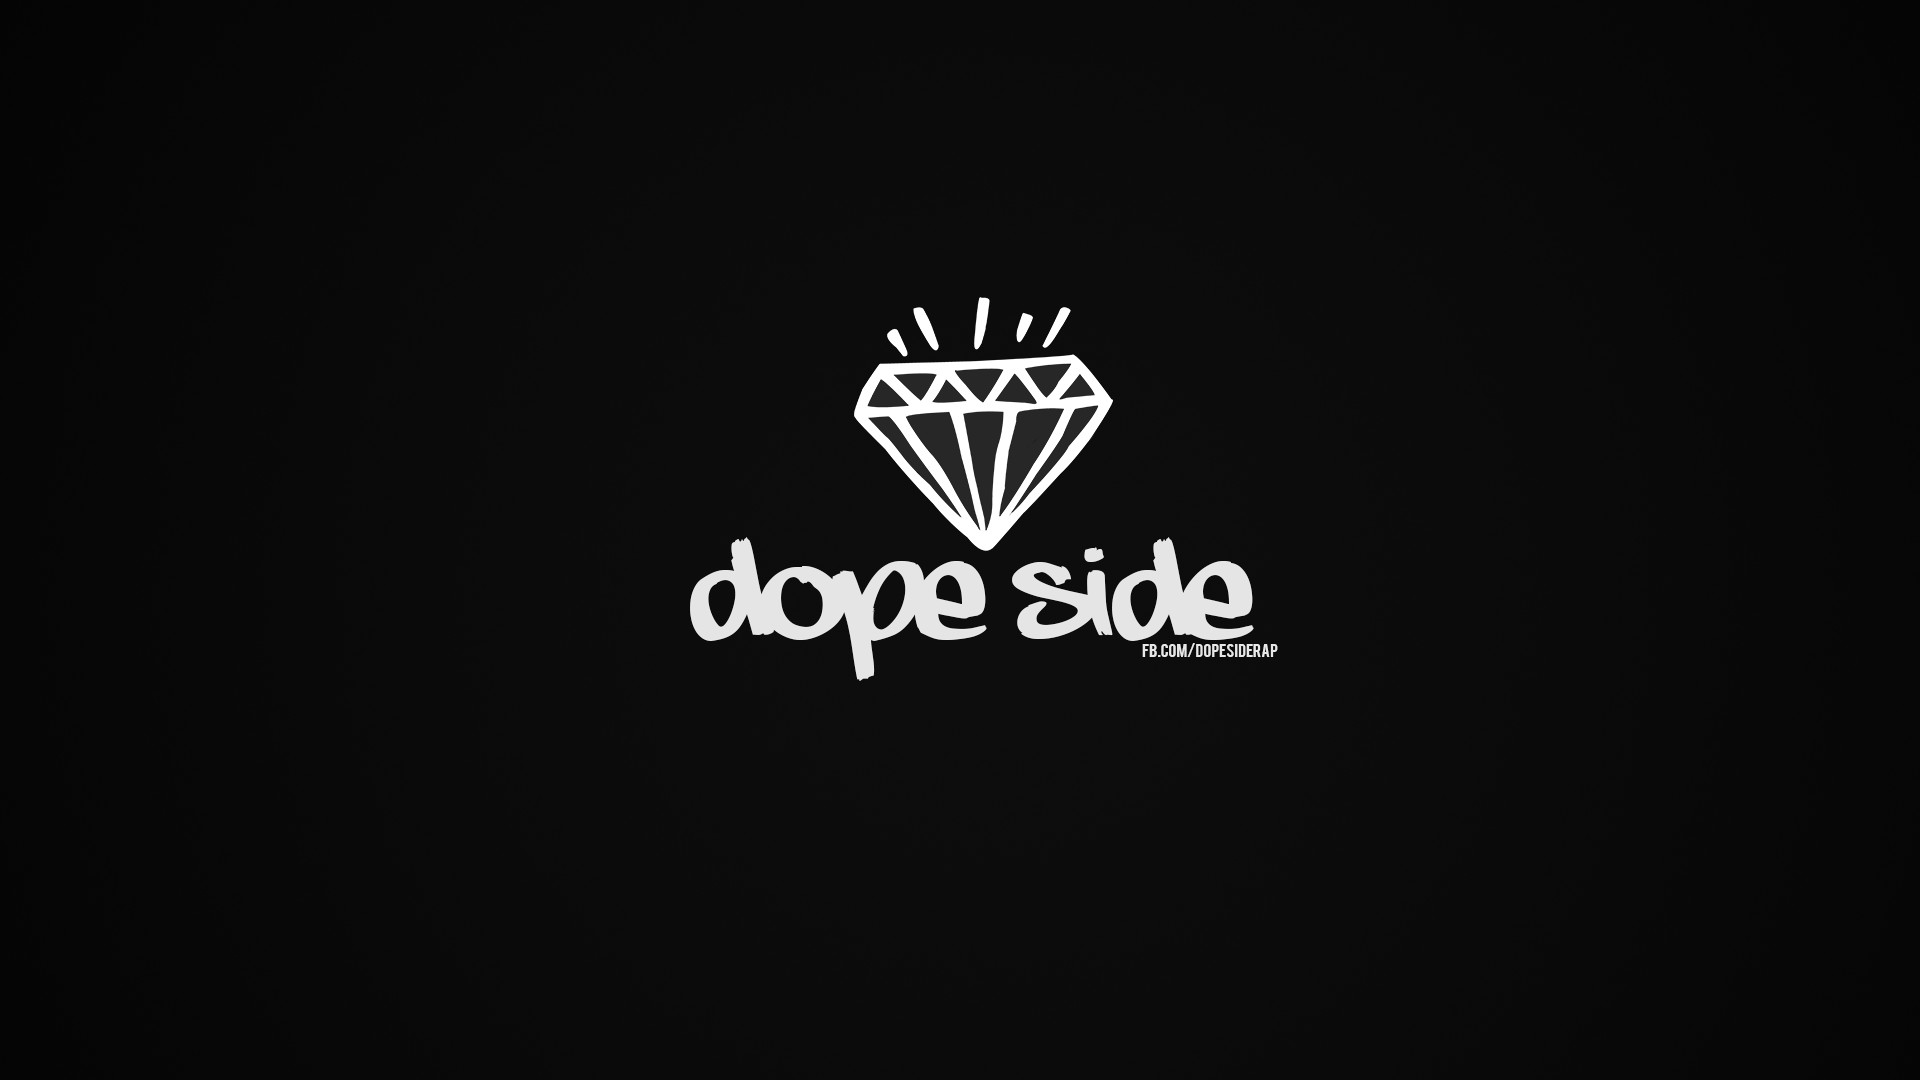 Jordan iphone wallpaper tumblr – Dope Wallpapers Free Wallpapers Background  Images Hippowallpapers